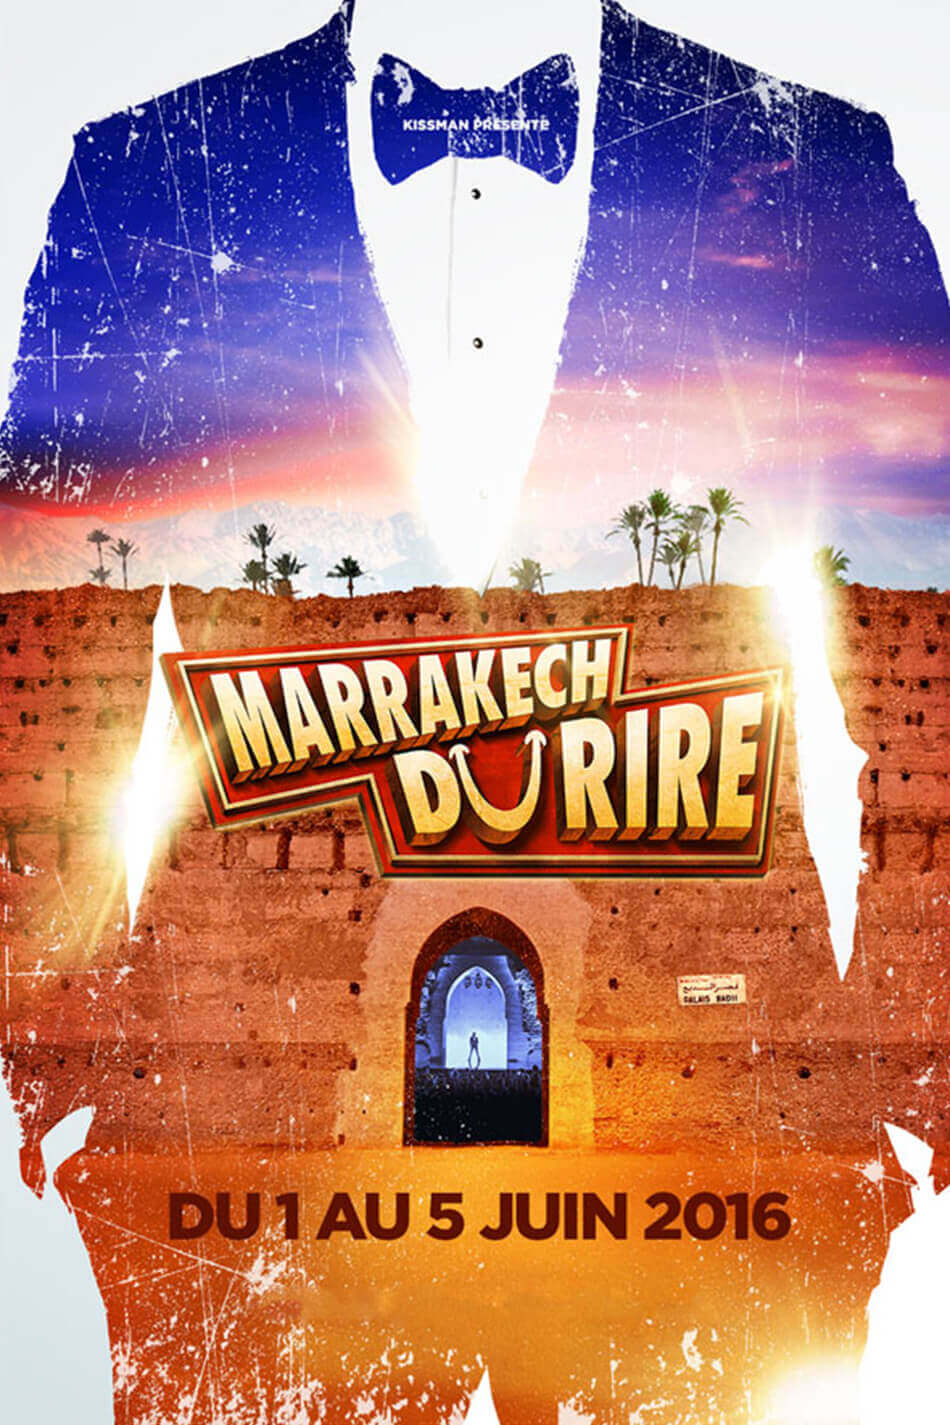 Marrakech du rire 2016